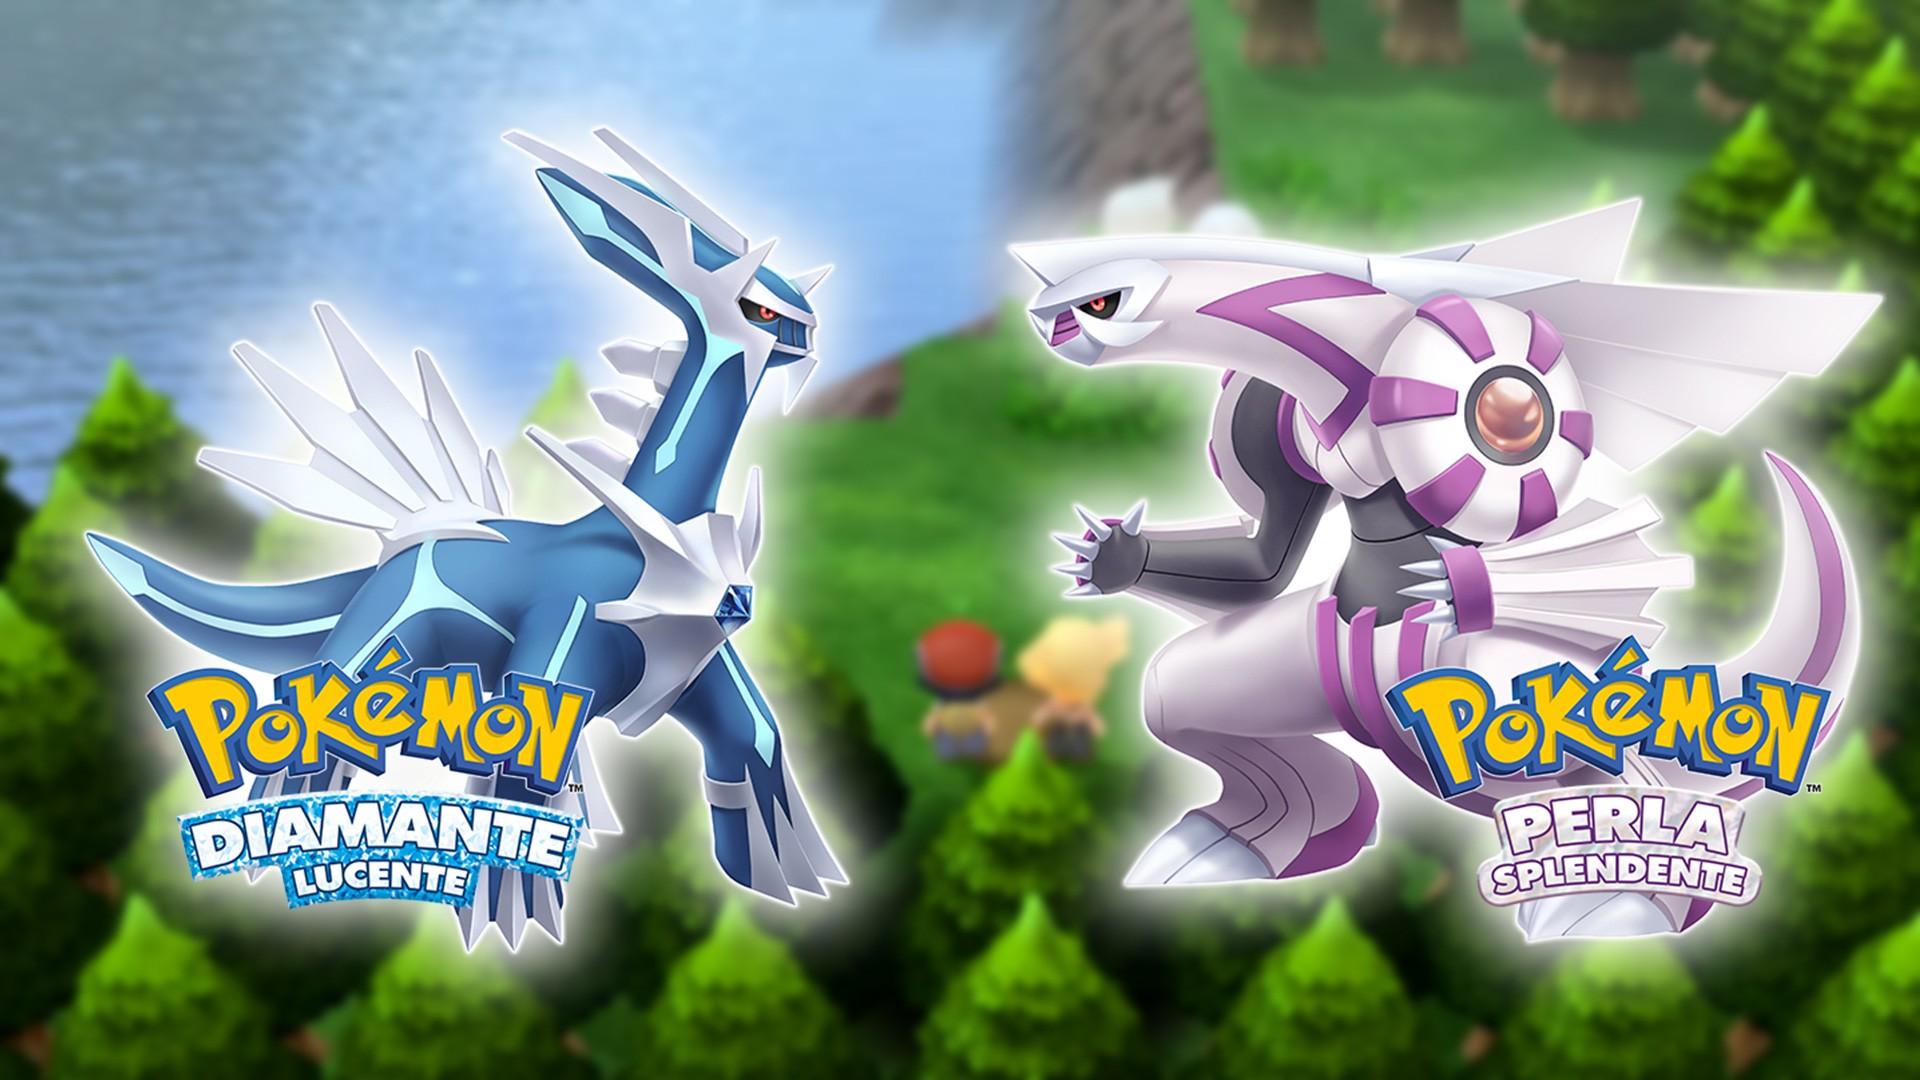 Pokémon DP remake NintendOn